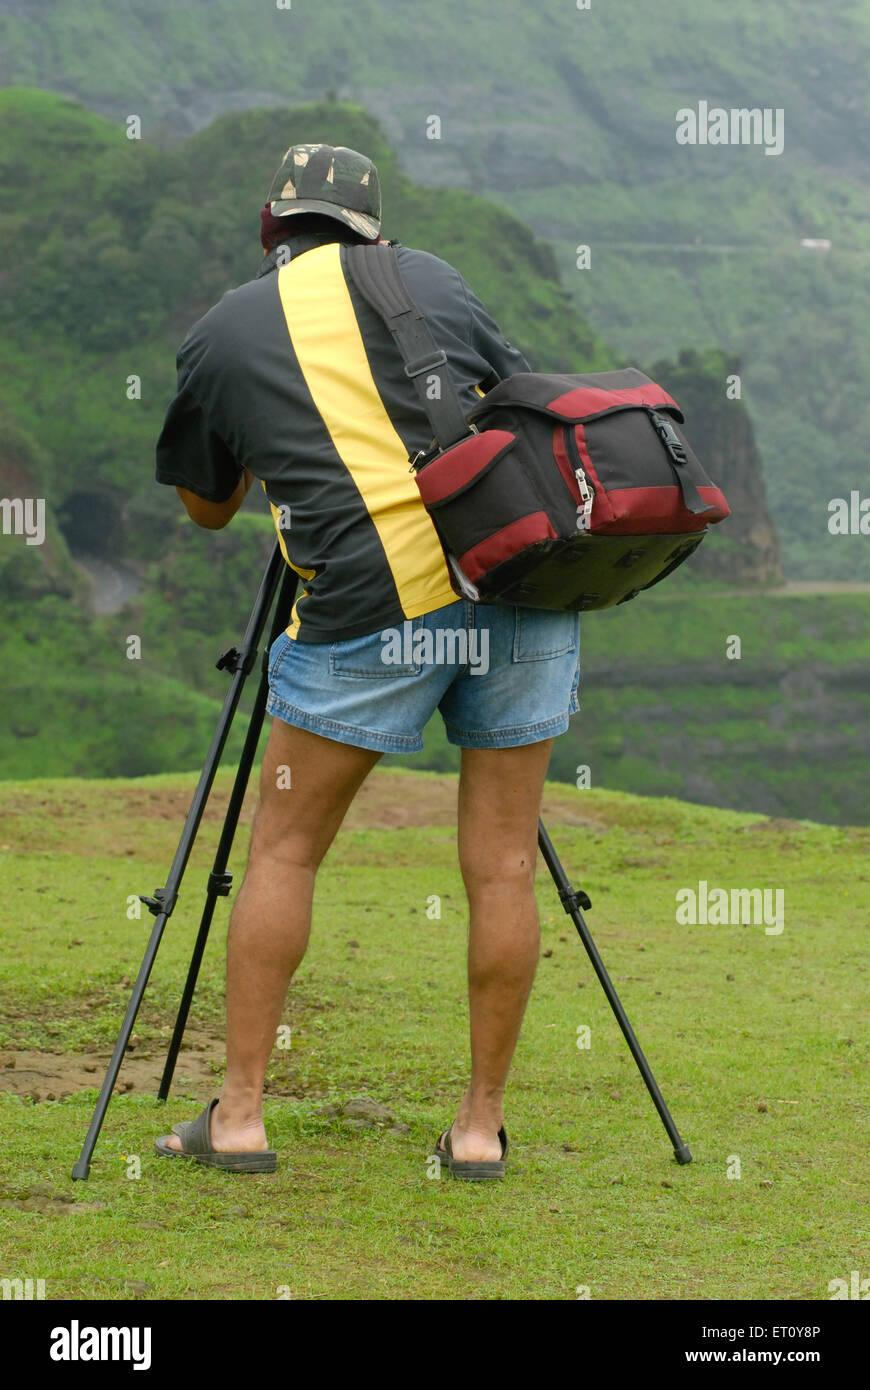 Tournage à Malshej Ghat photographe; Maharashtra Inde; M. N° 778C Photo Stock